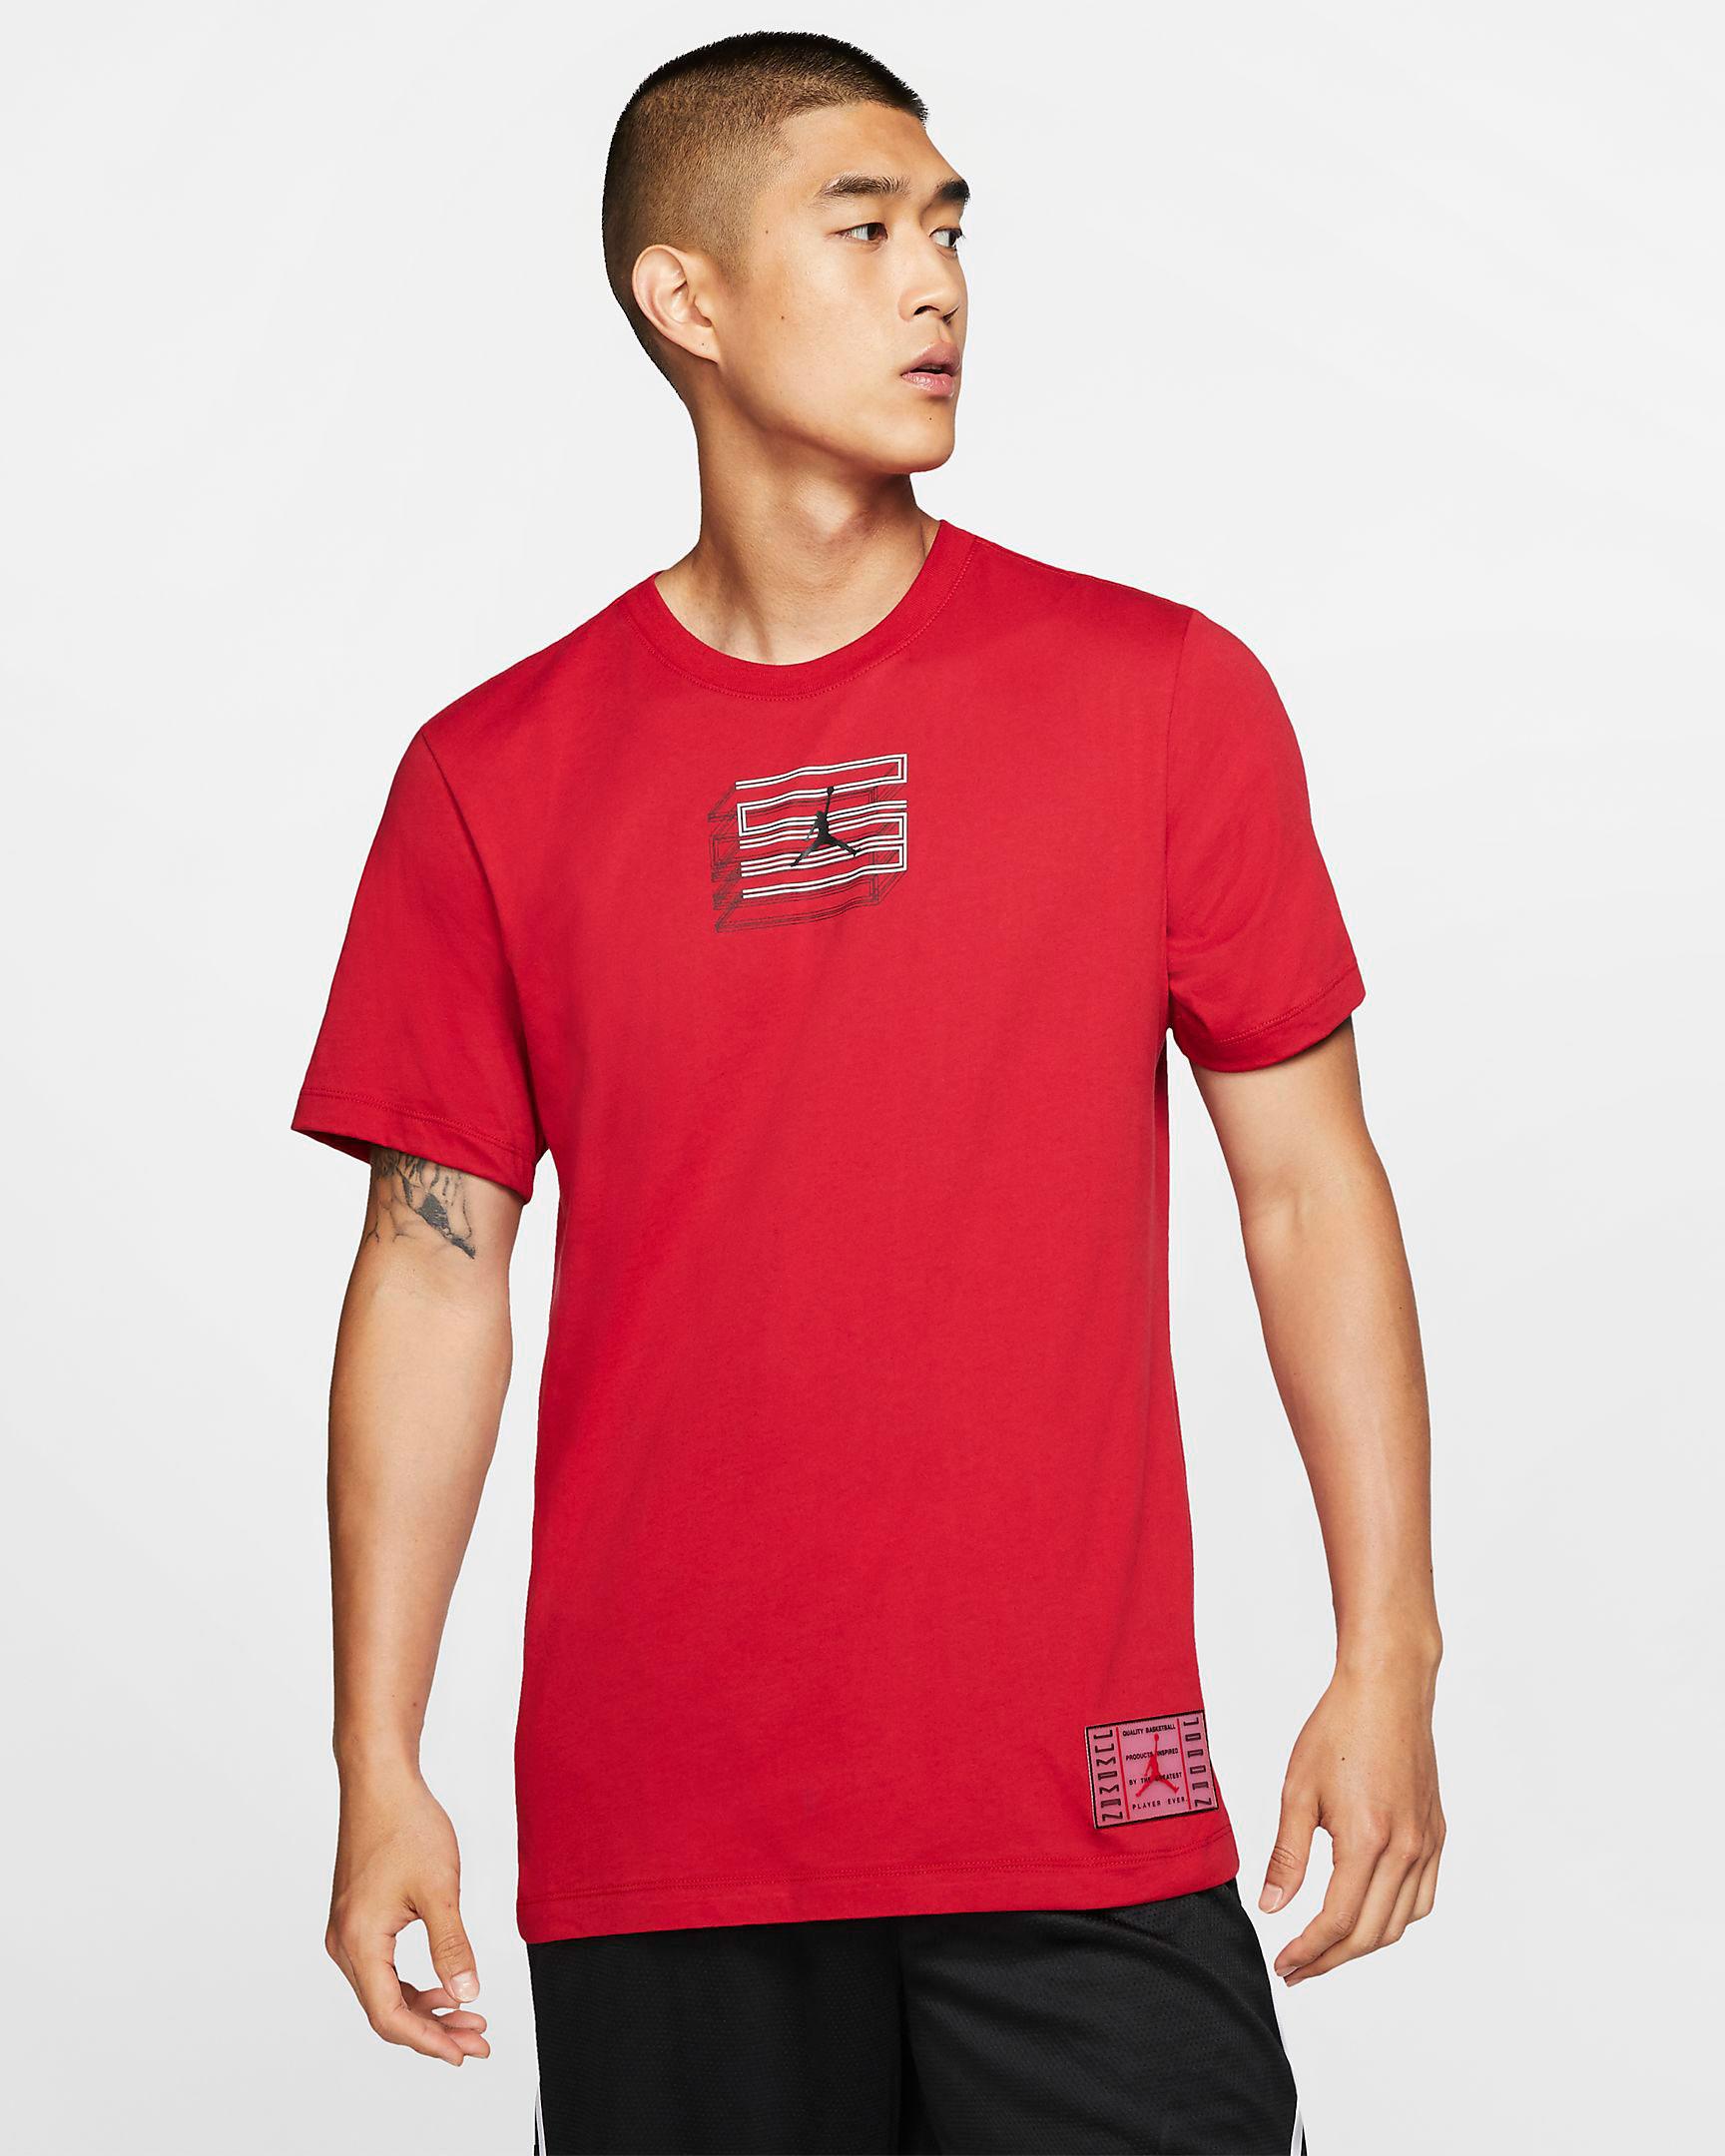 air-jordan-11-bred-sneaker-tee-shirt-1